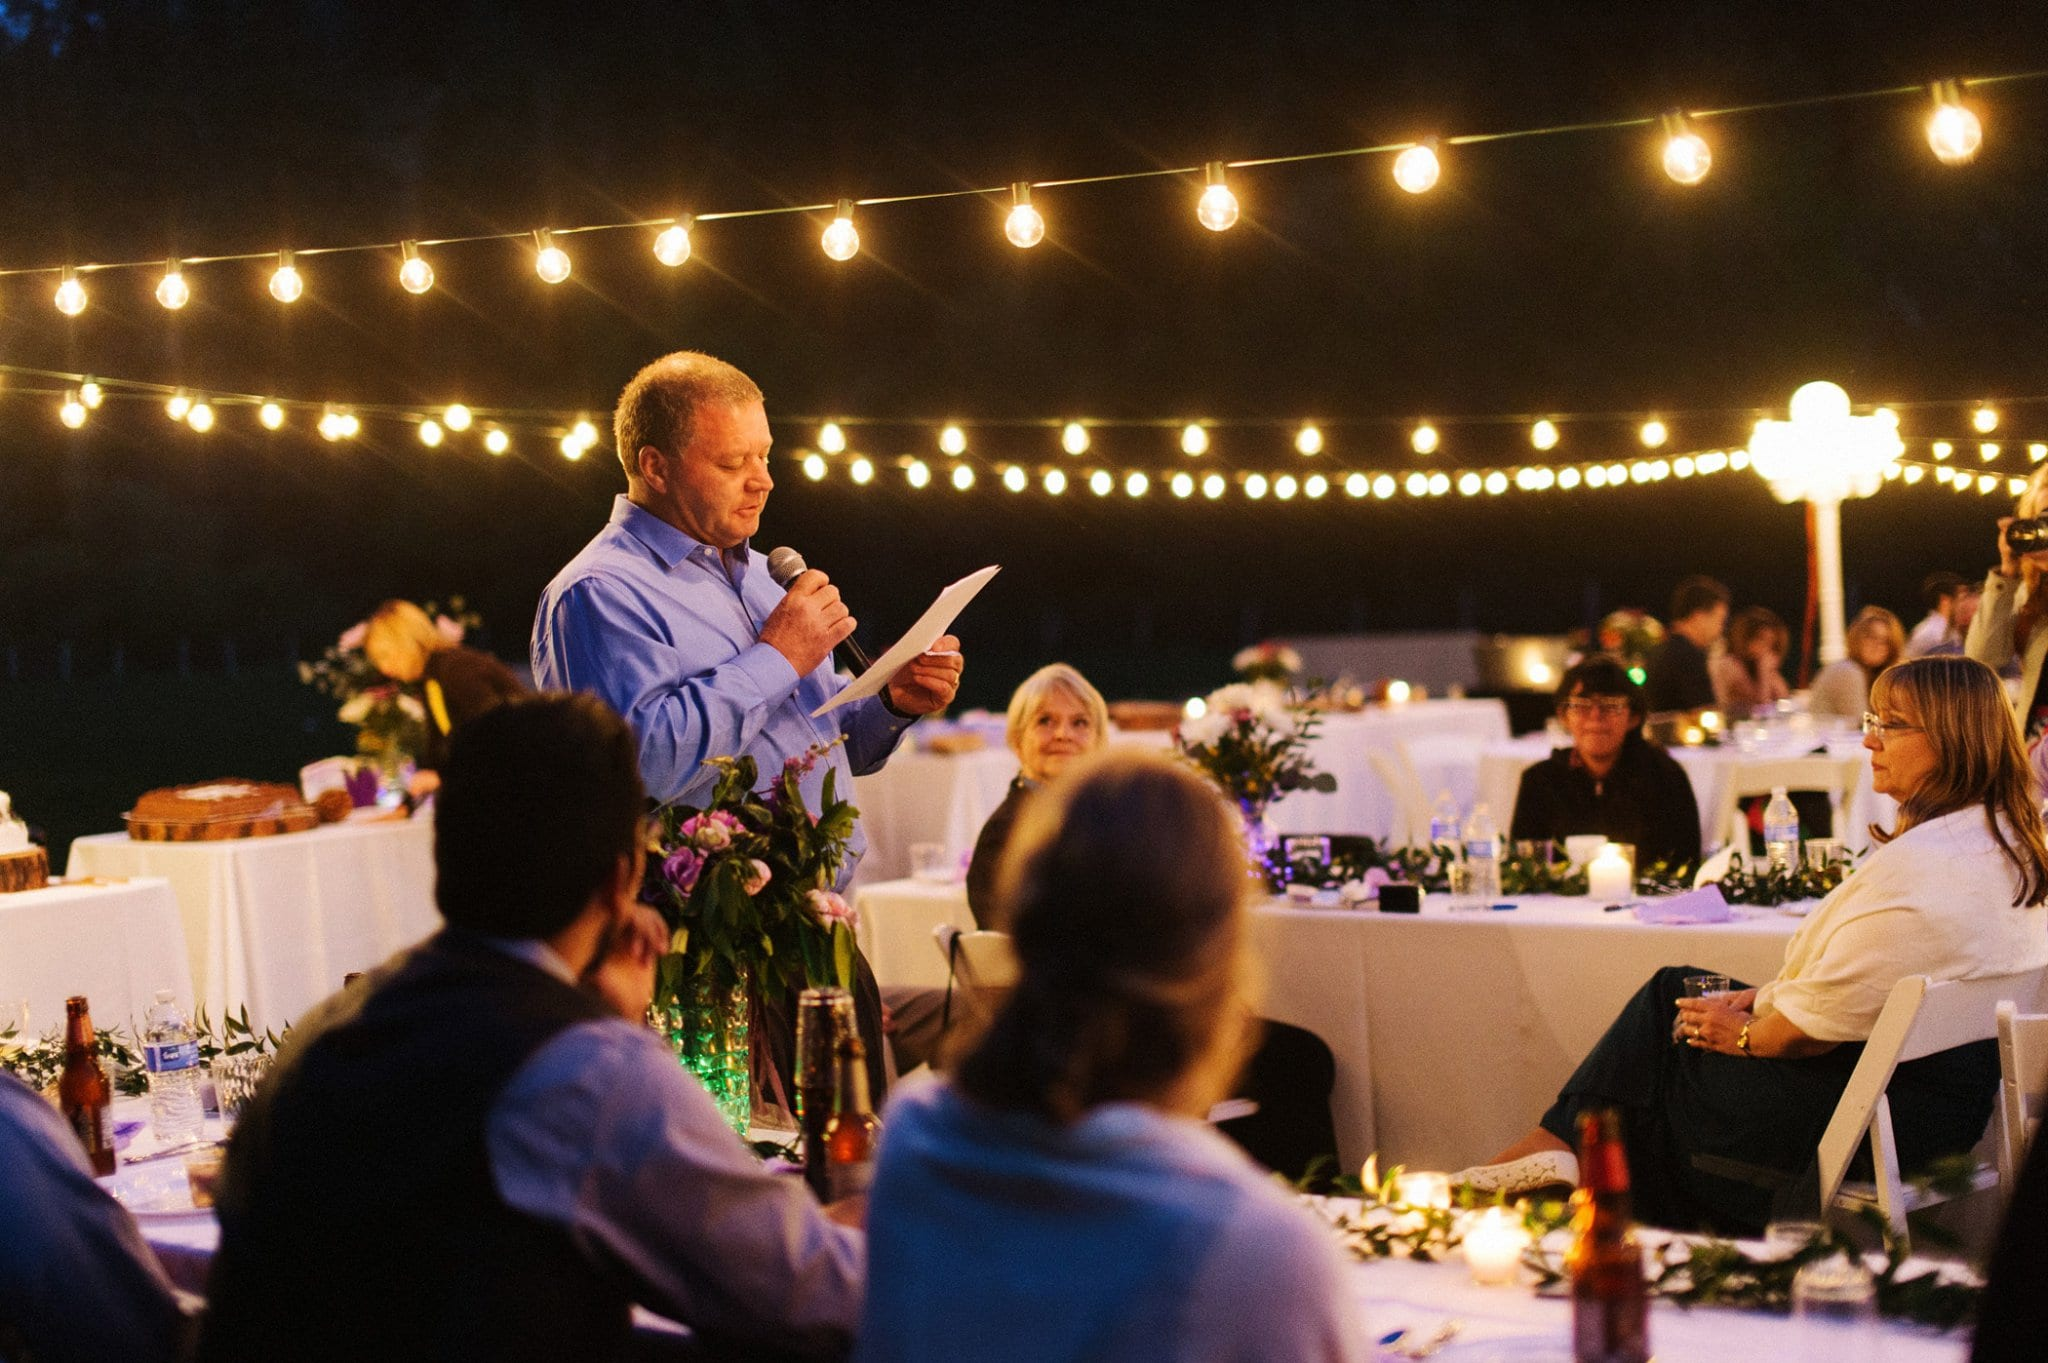 Tonto Creek Camp wedding reception outdoors